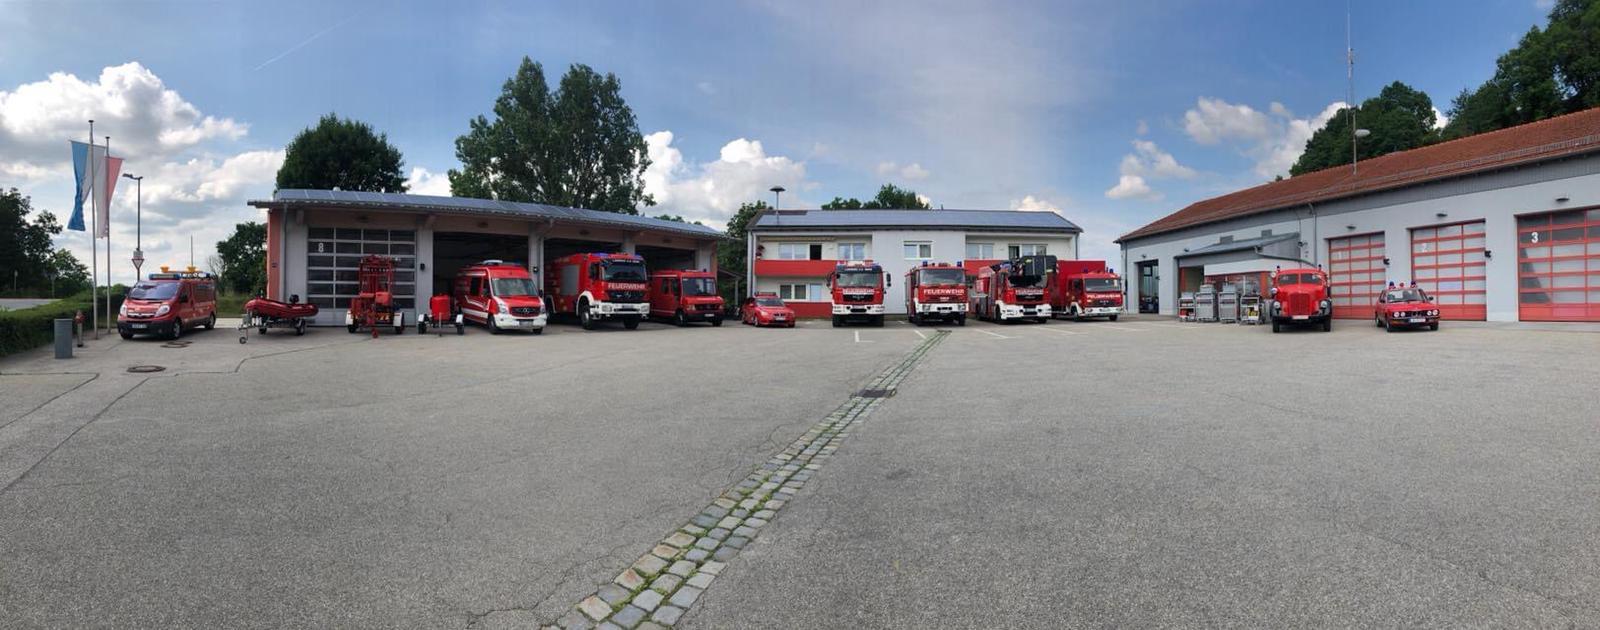 Feuerwehr Landau a. d. Isar